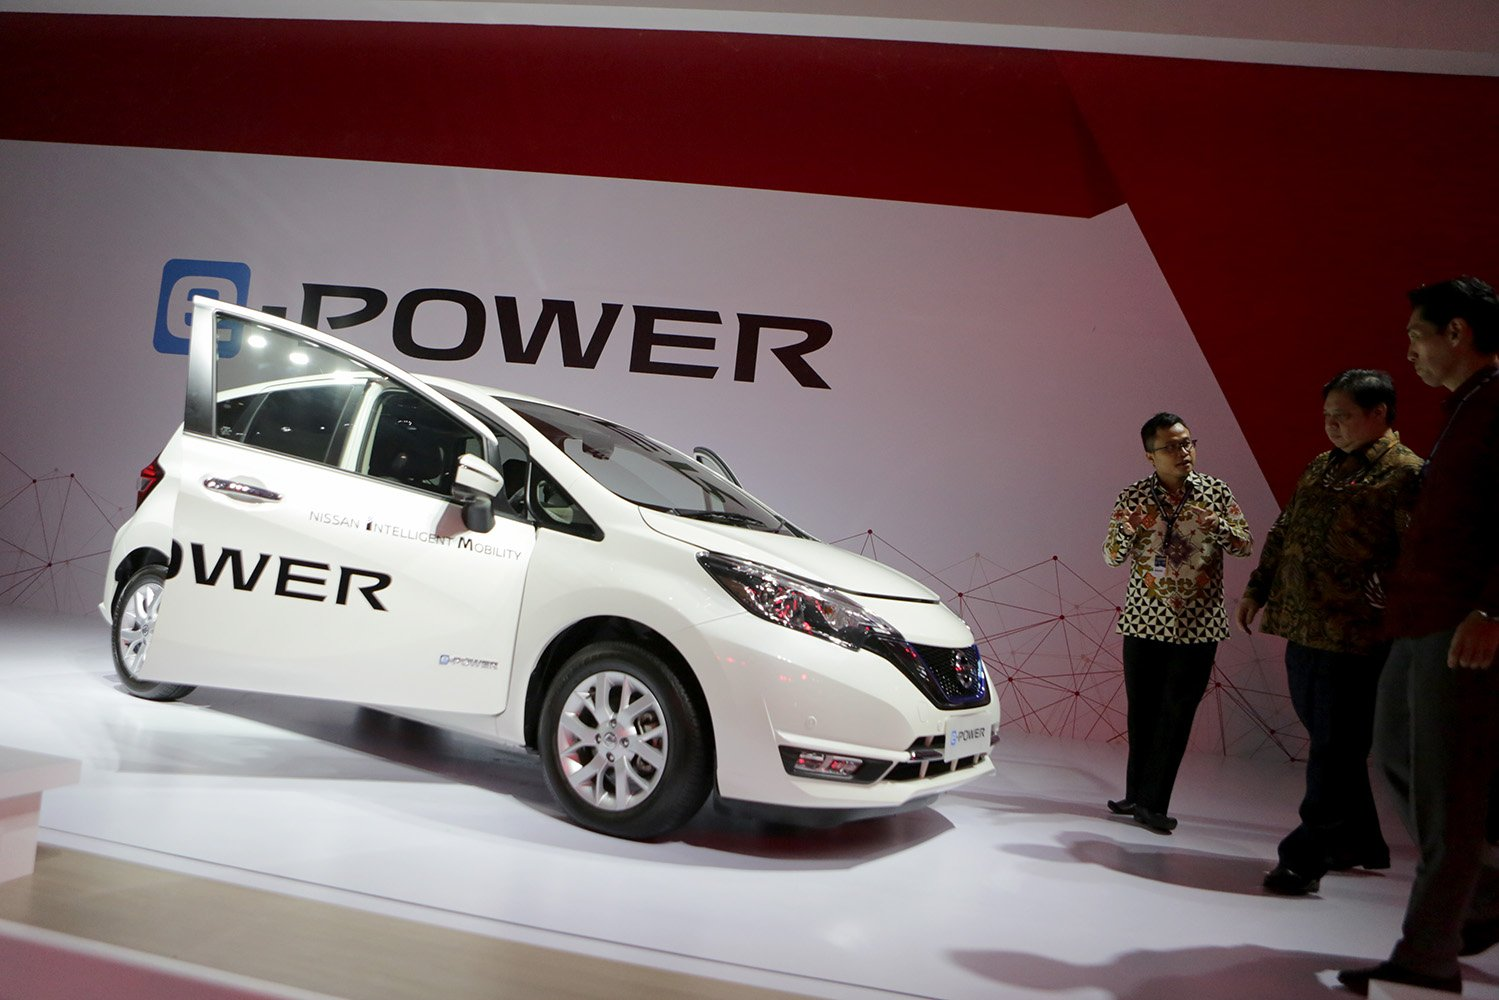 Menteri Perindustrian Airlangga Hartarto meninjau mobil listrik Nissan E-Power di ajang GIIAS 2017, Tangerang Banten, Kamis (10/8).